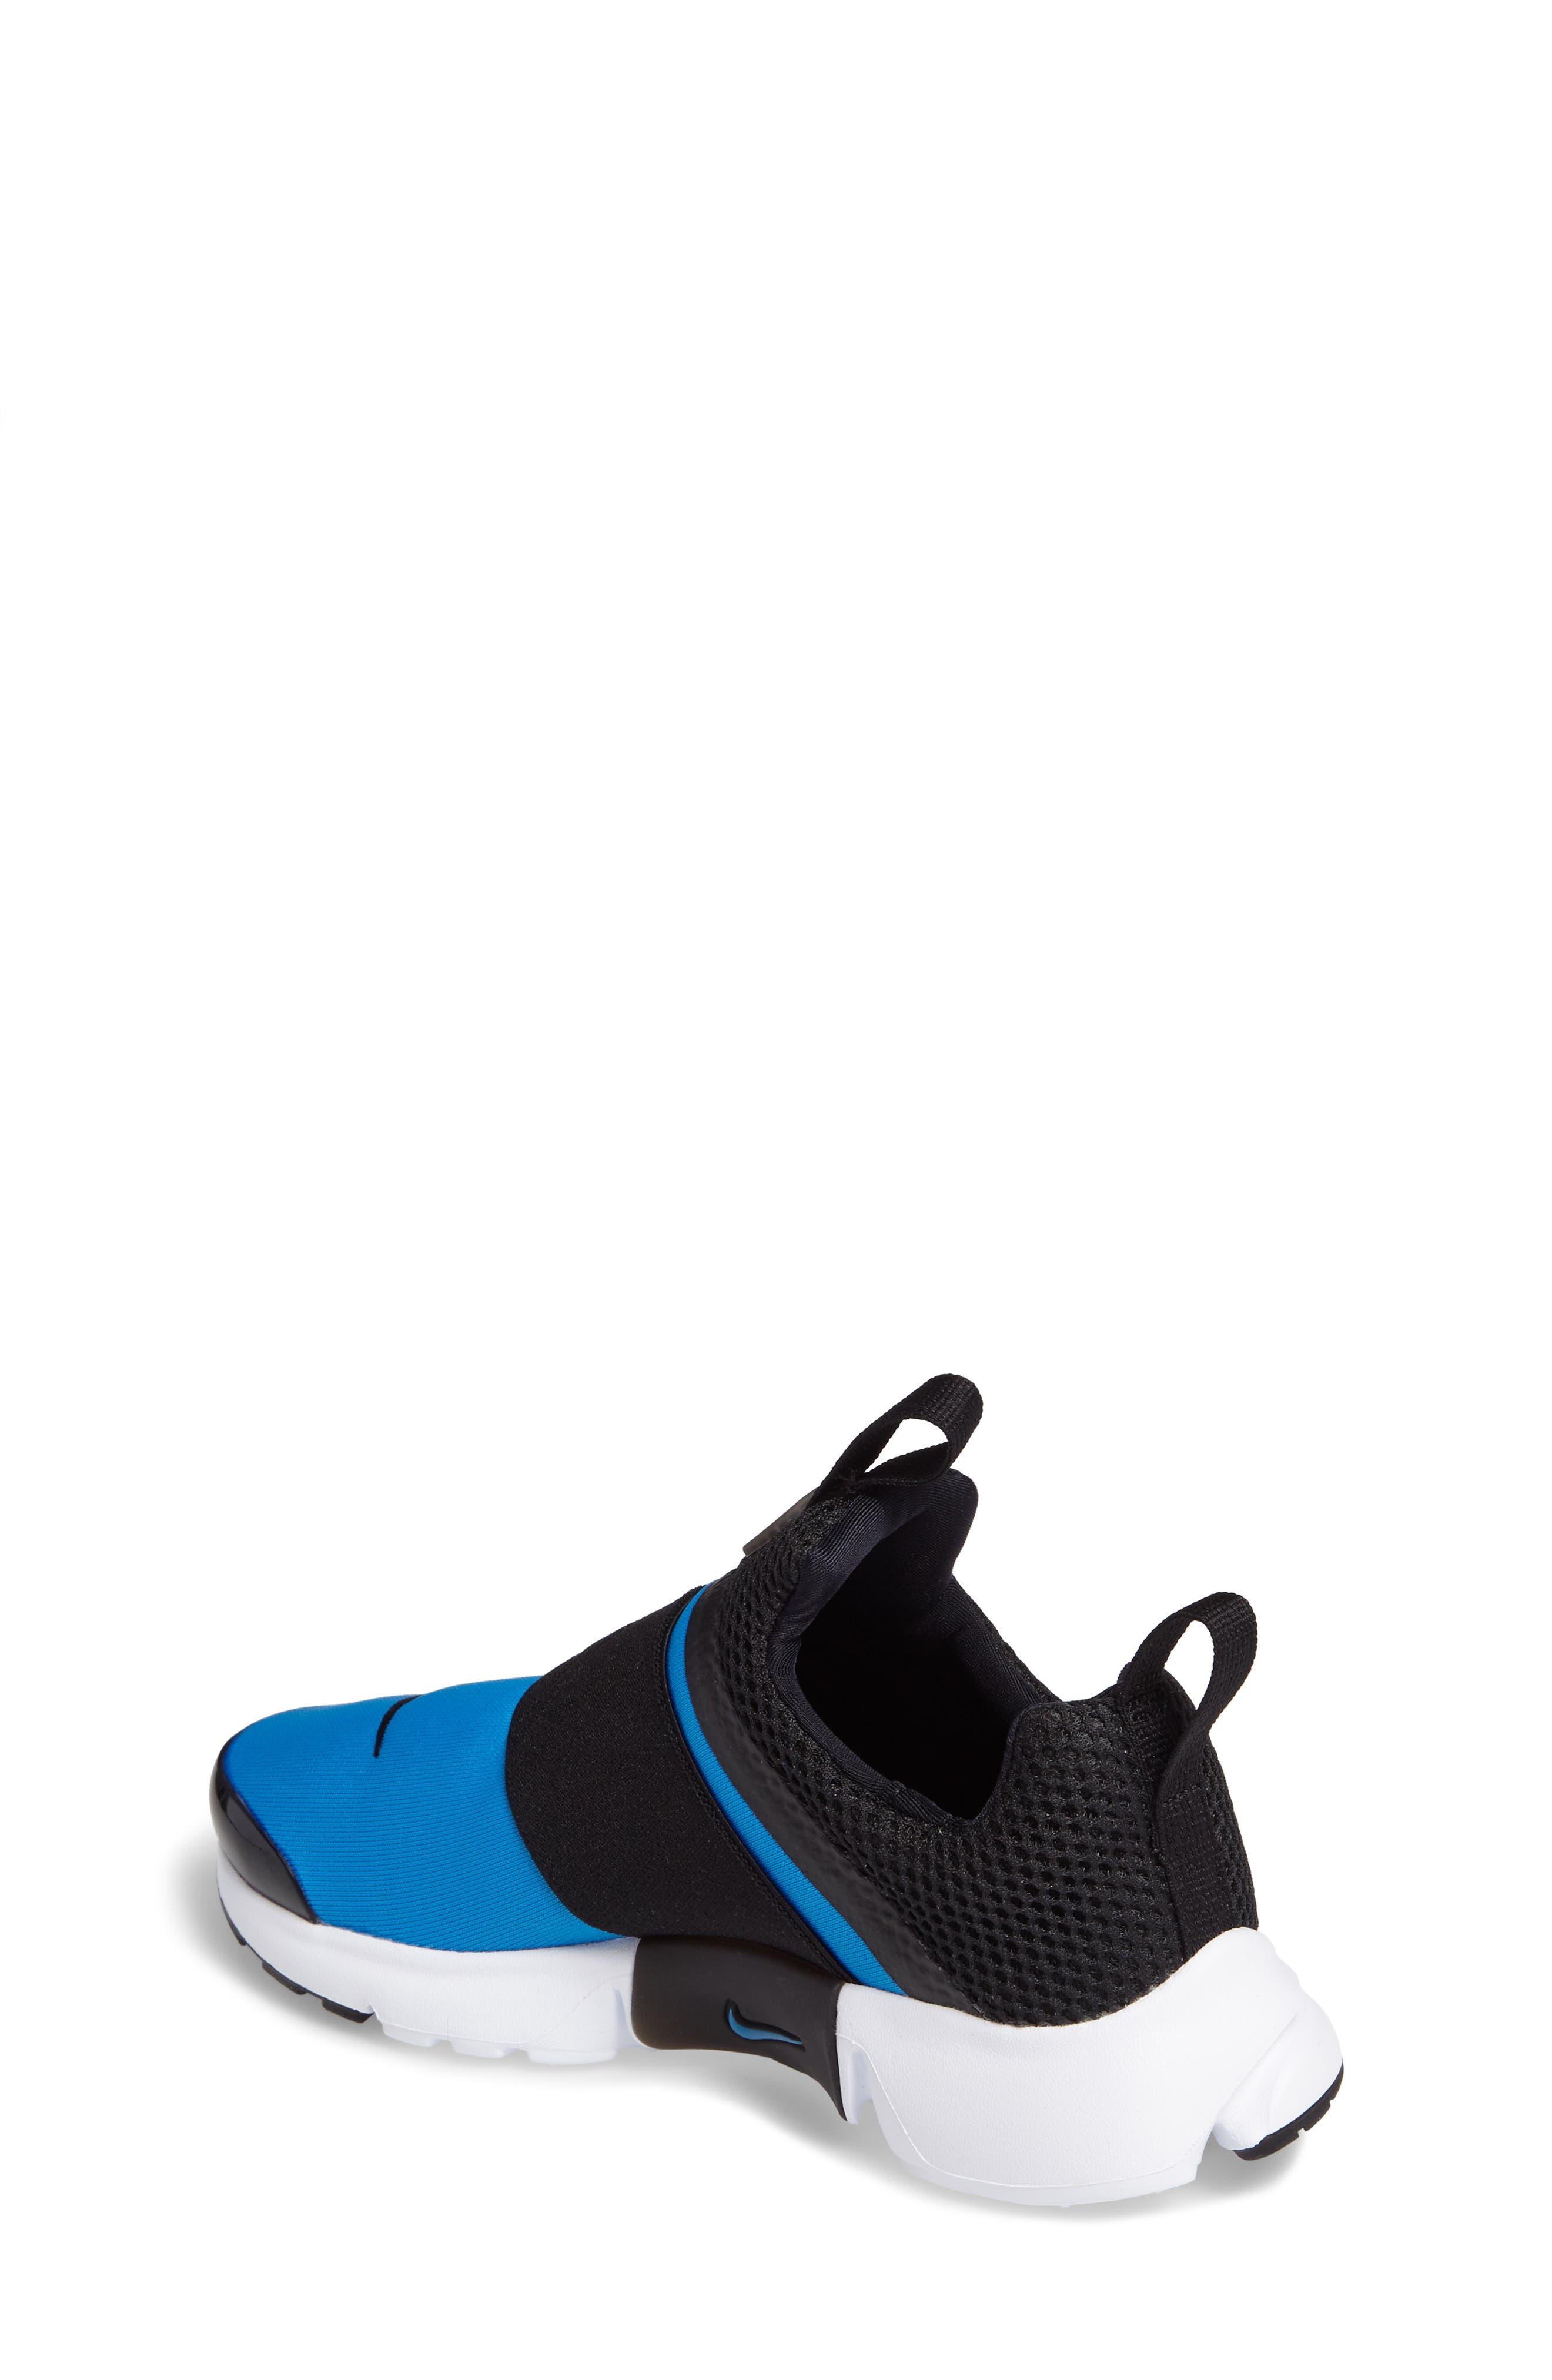 Presto Extreme Sneaker,                             Alternate thumbnail 21, color,